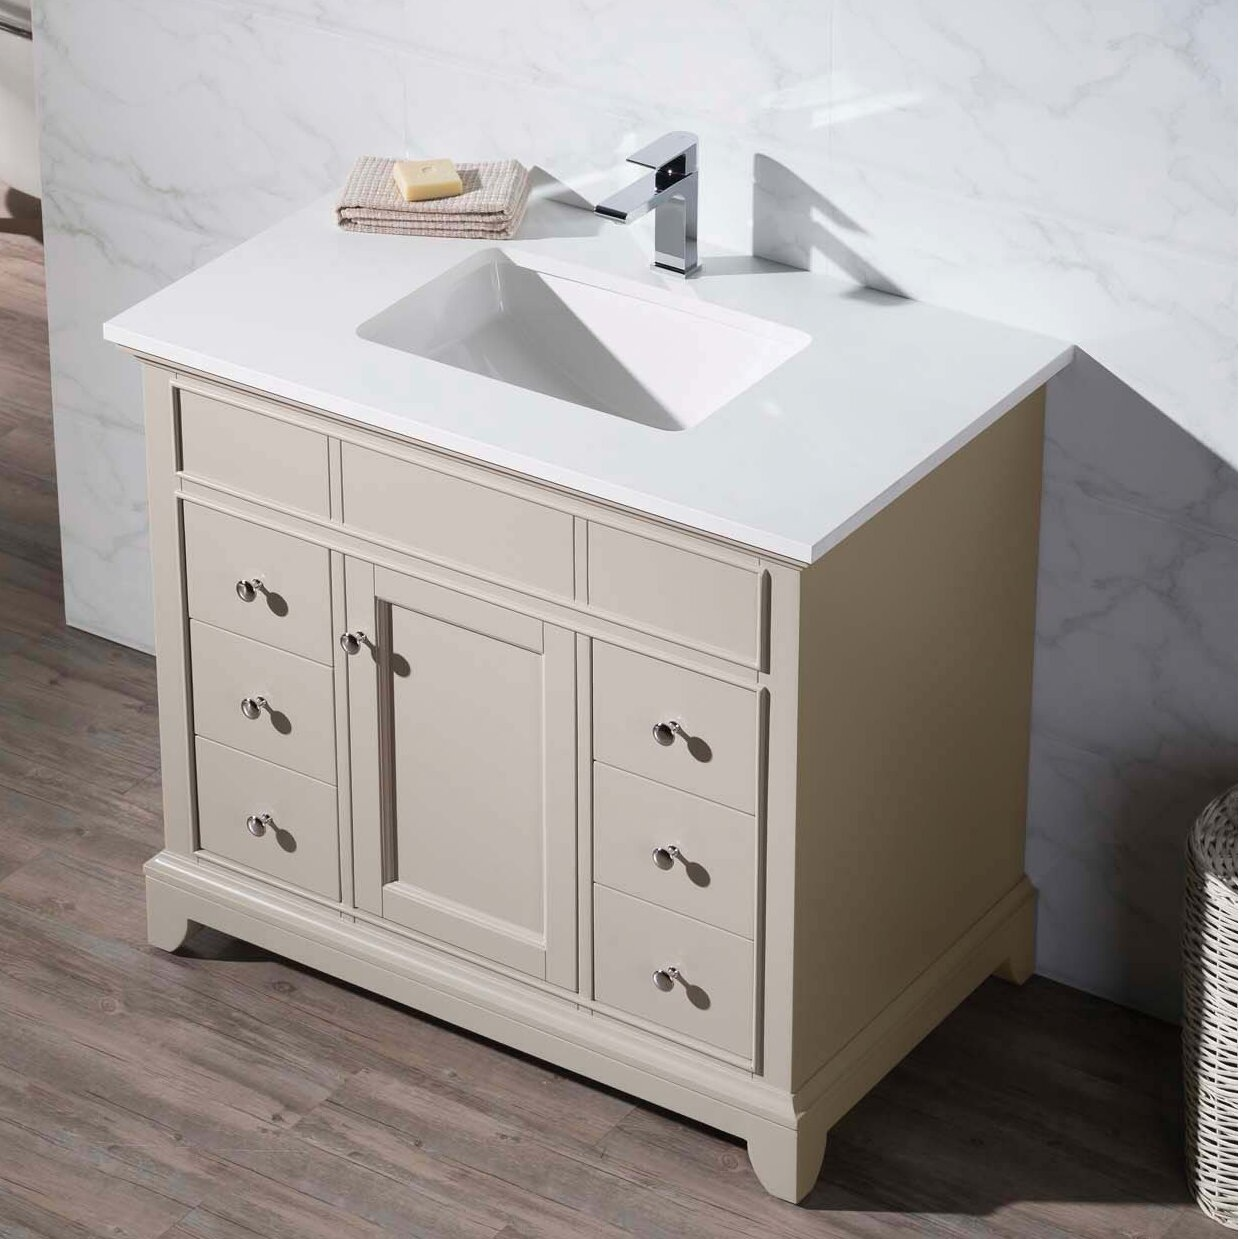 dcor design dyer  single bathroom vanity set  wayfair - dcor design dyer quot single bathroom vanity set